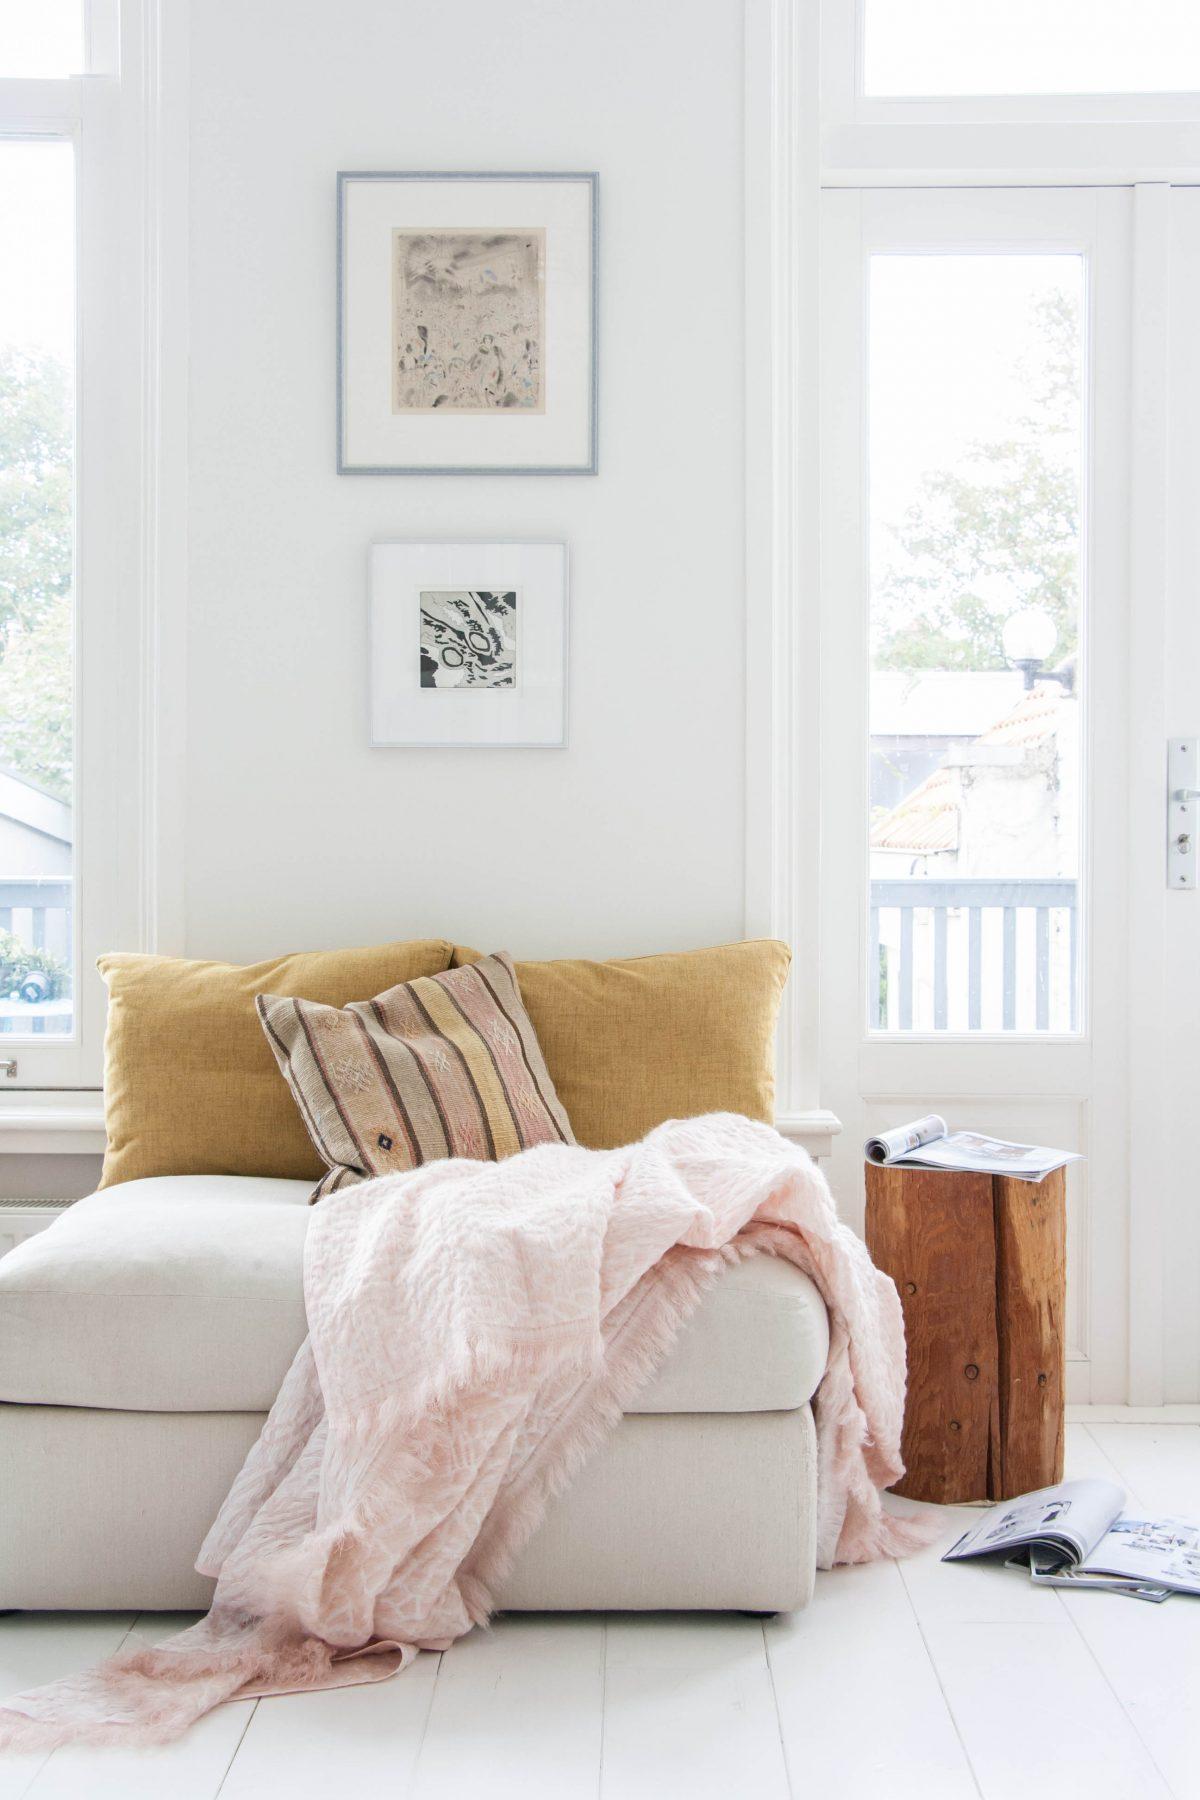 Hide deken roze Nienke Hoogvliet woonkamer foto Holy Marder